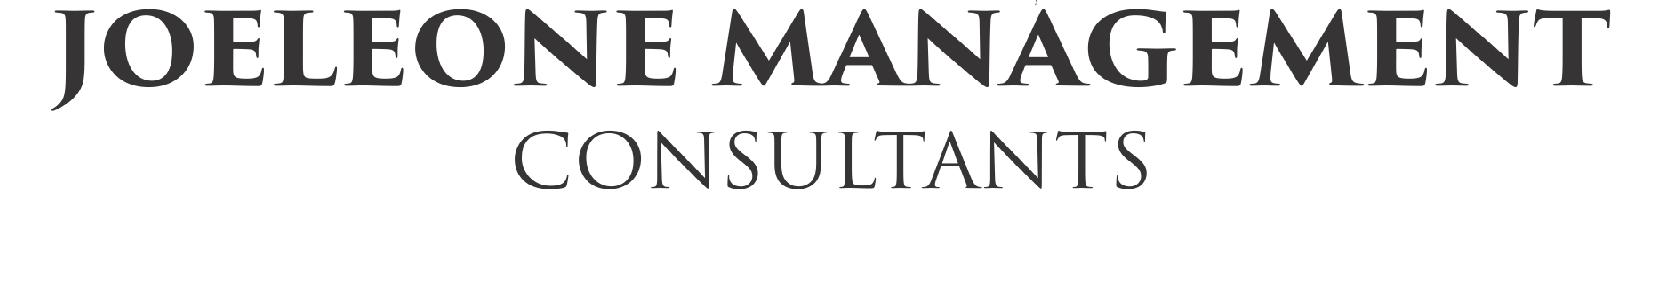 Joeleone Management Consultants